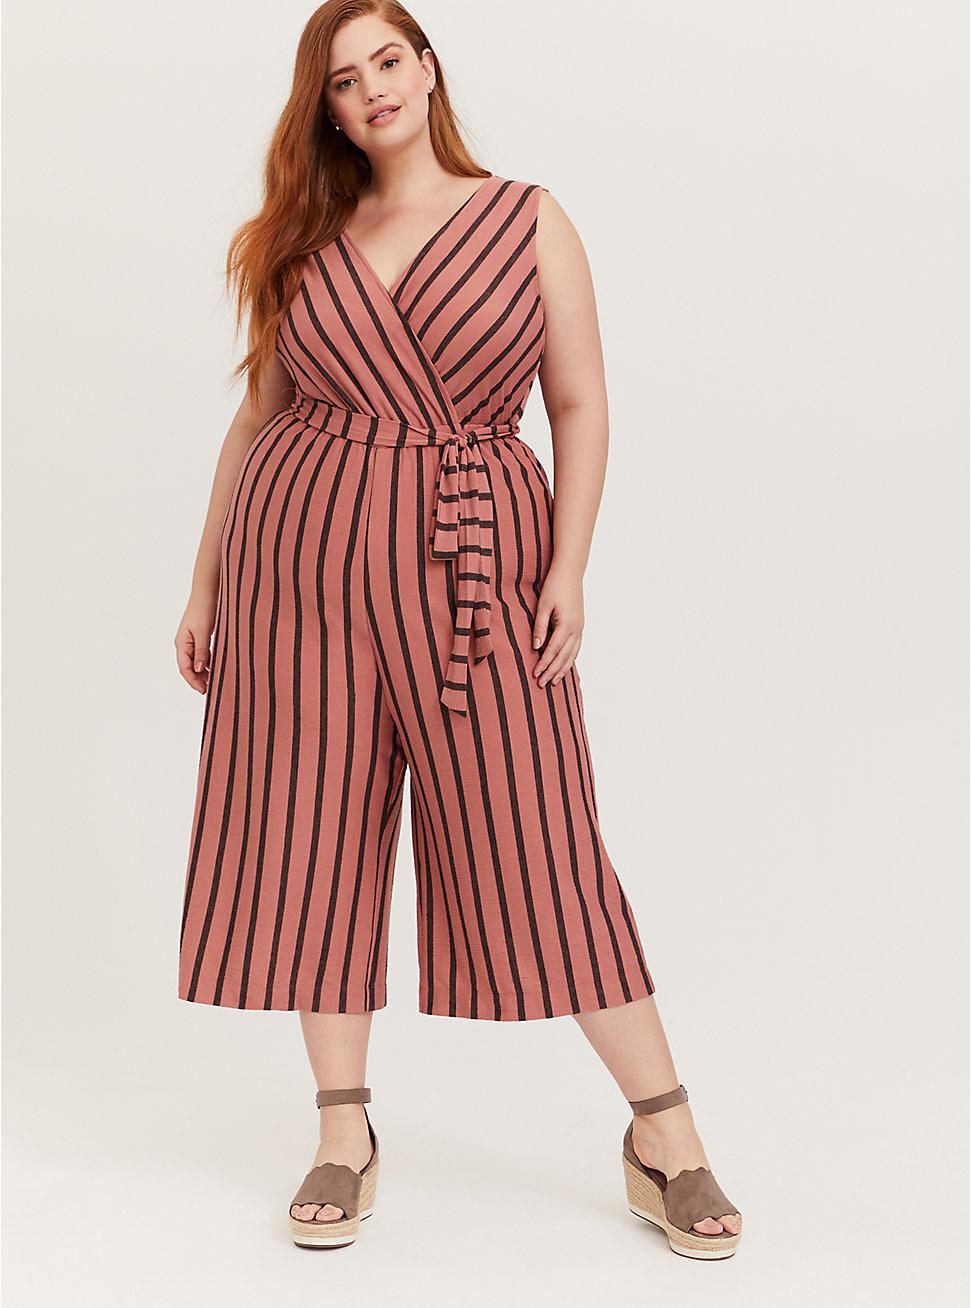 Model wearing the striped self-tie jumpsuit